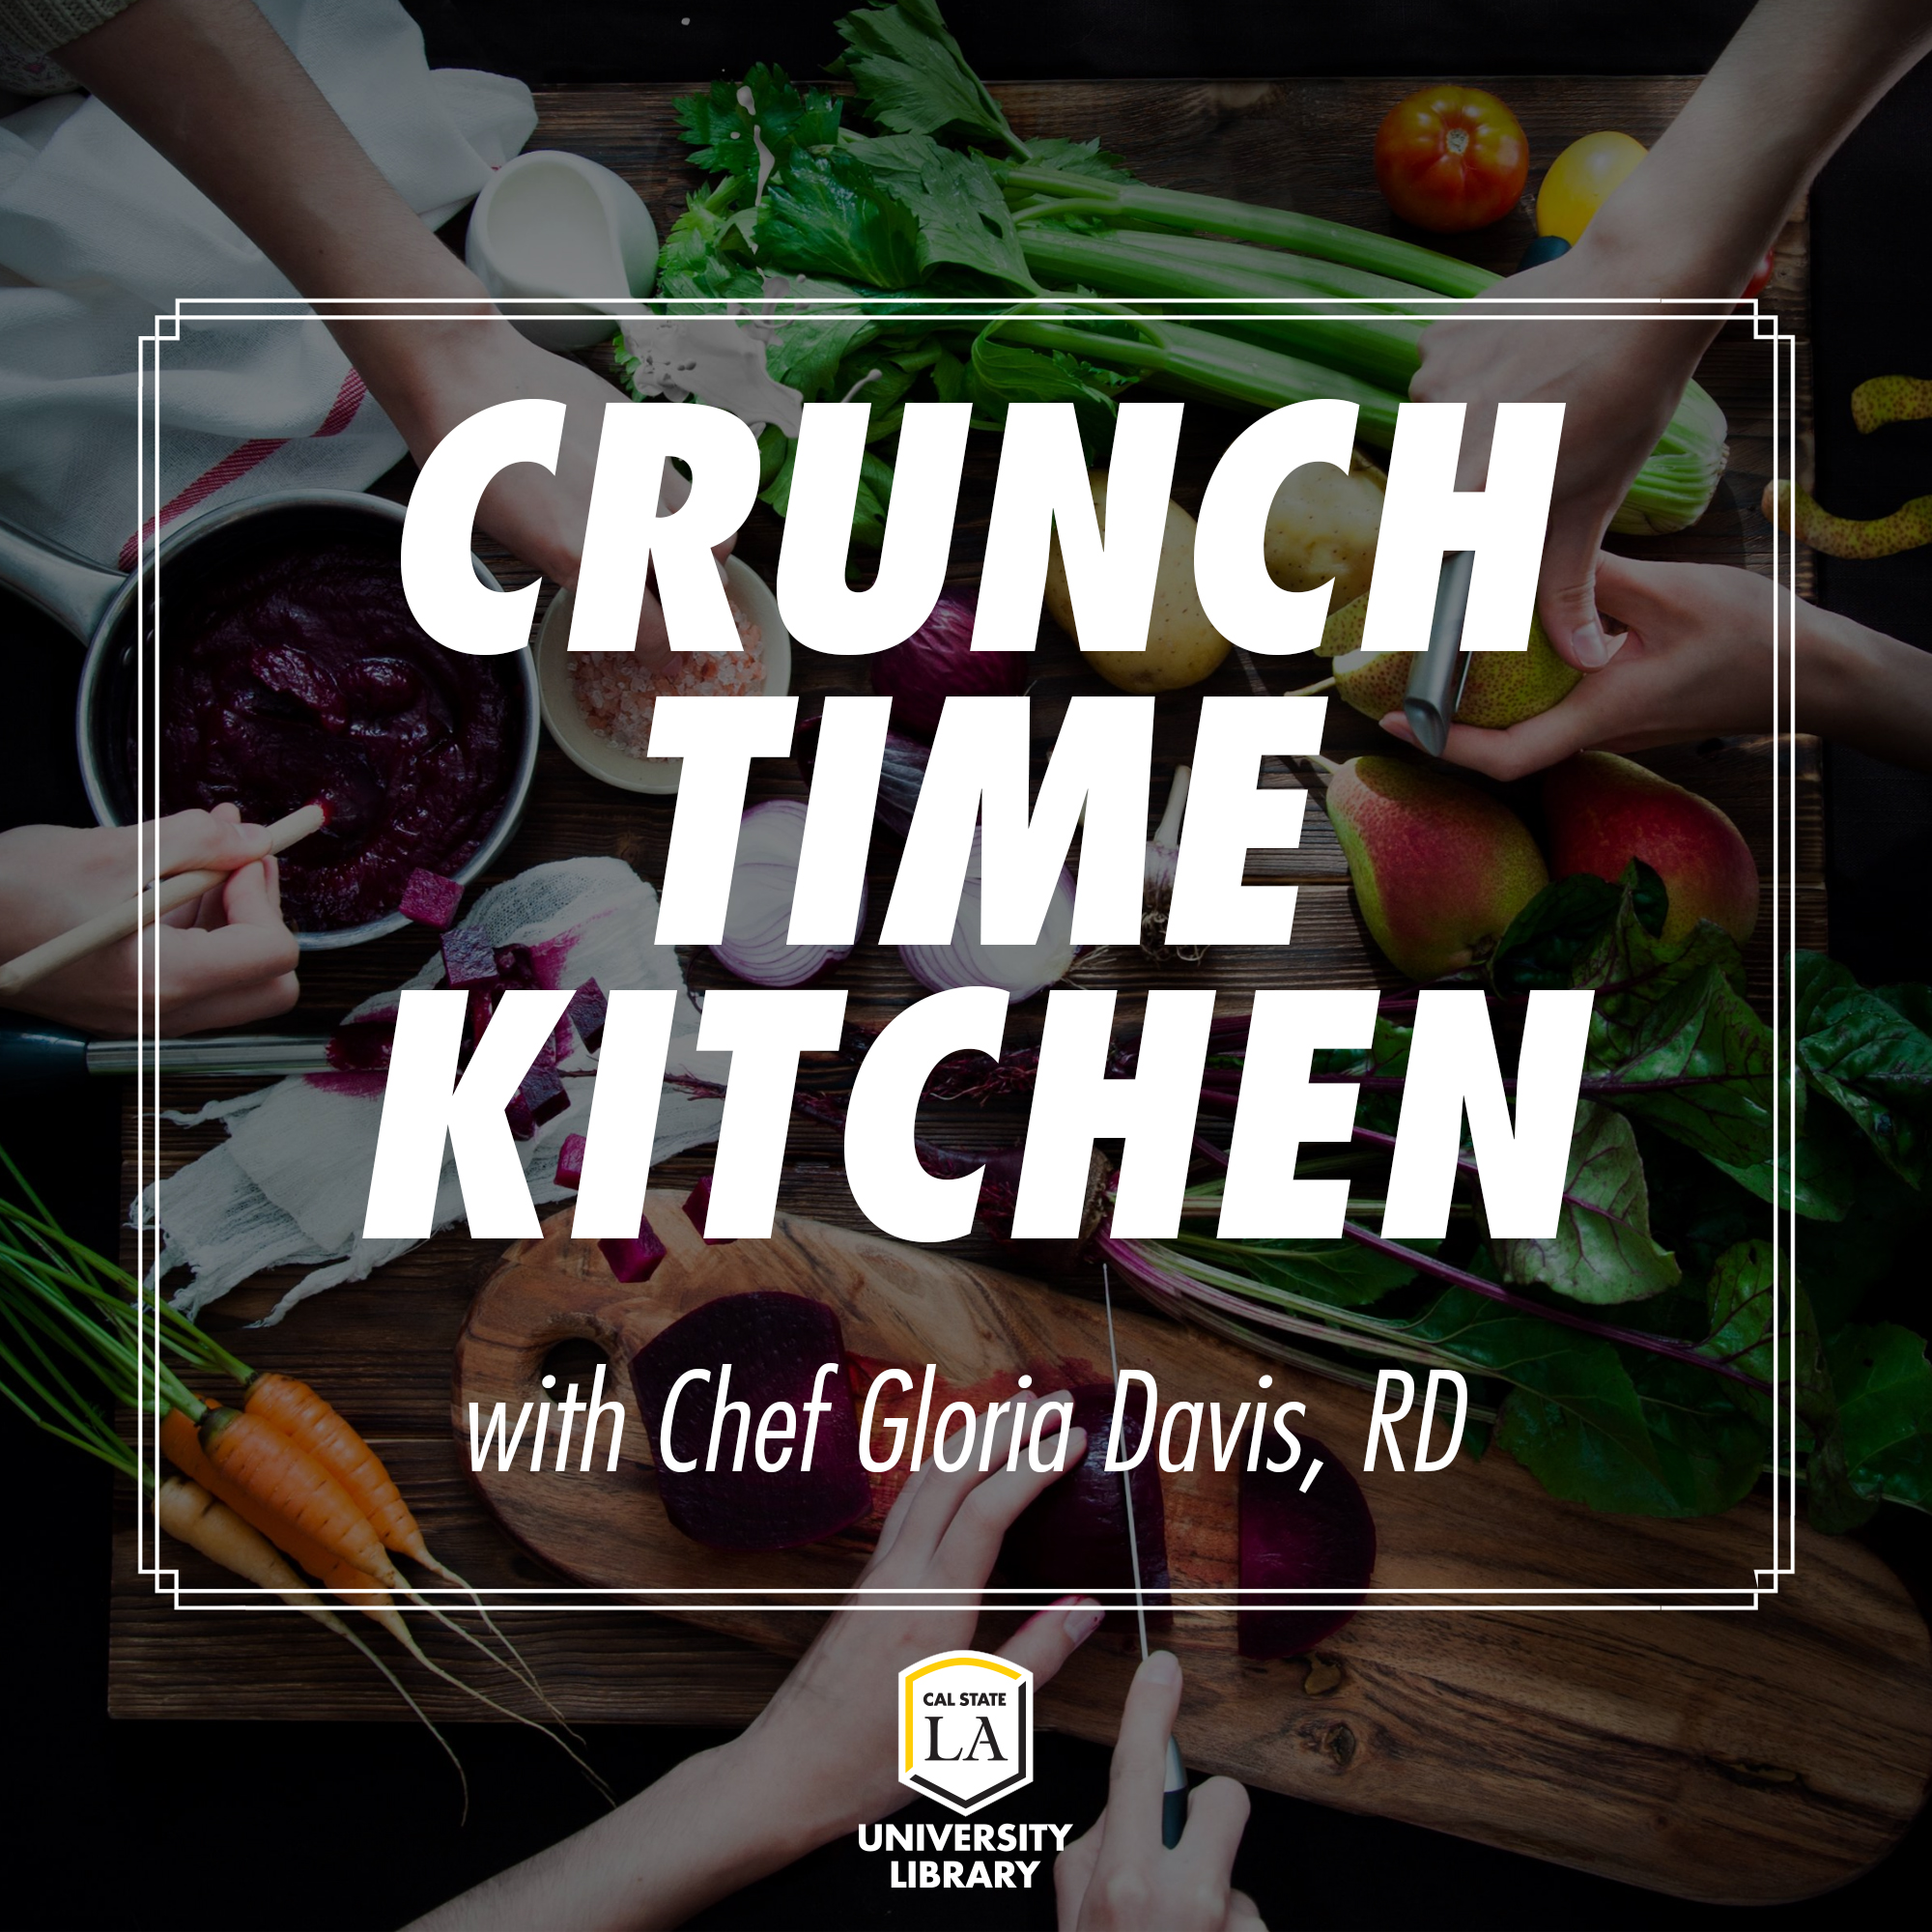 Crunch Time Kitchen with Chef Gloria Davis, RD